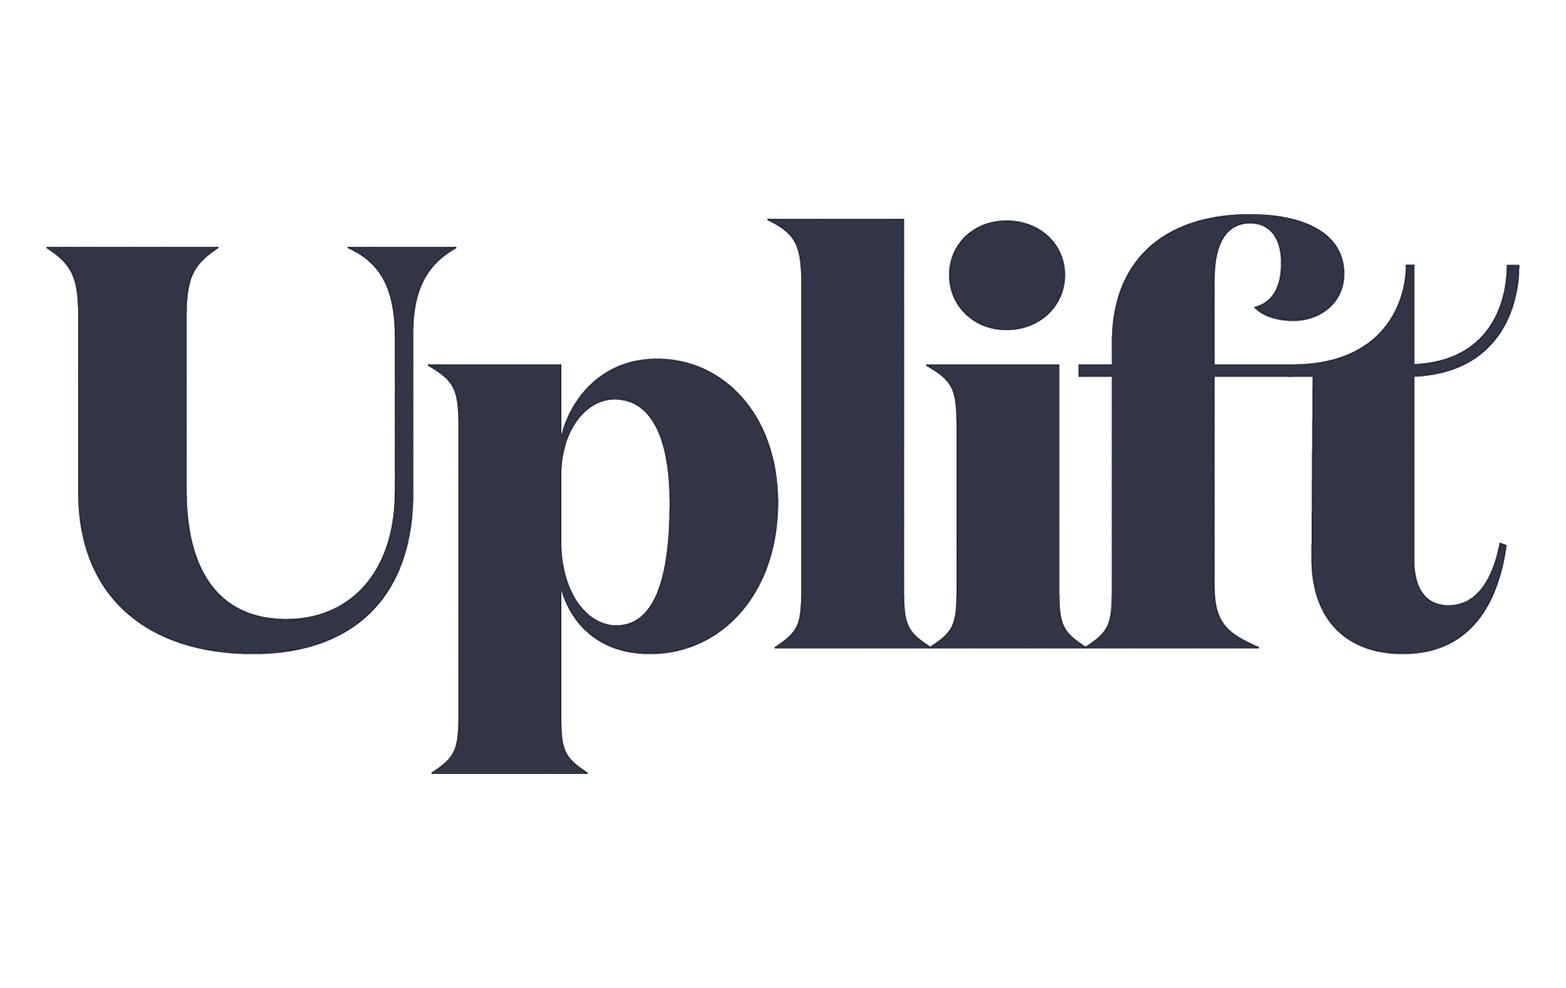 Uplift 2